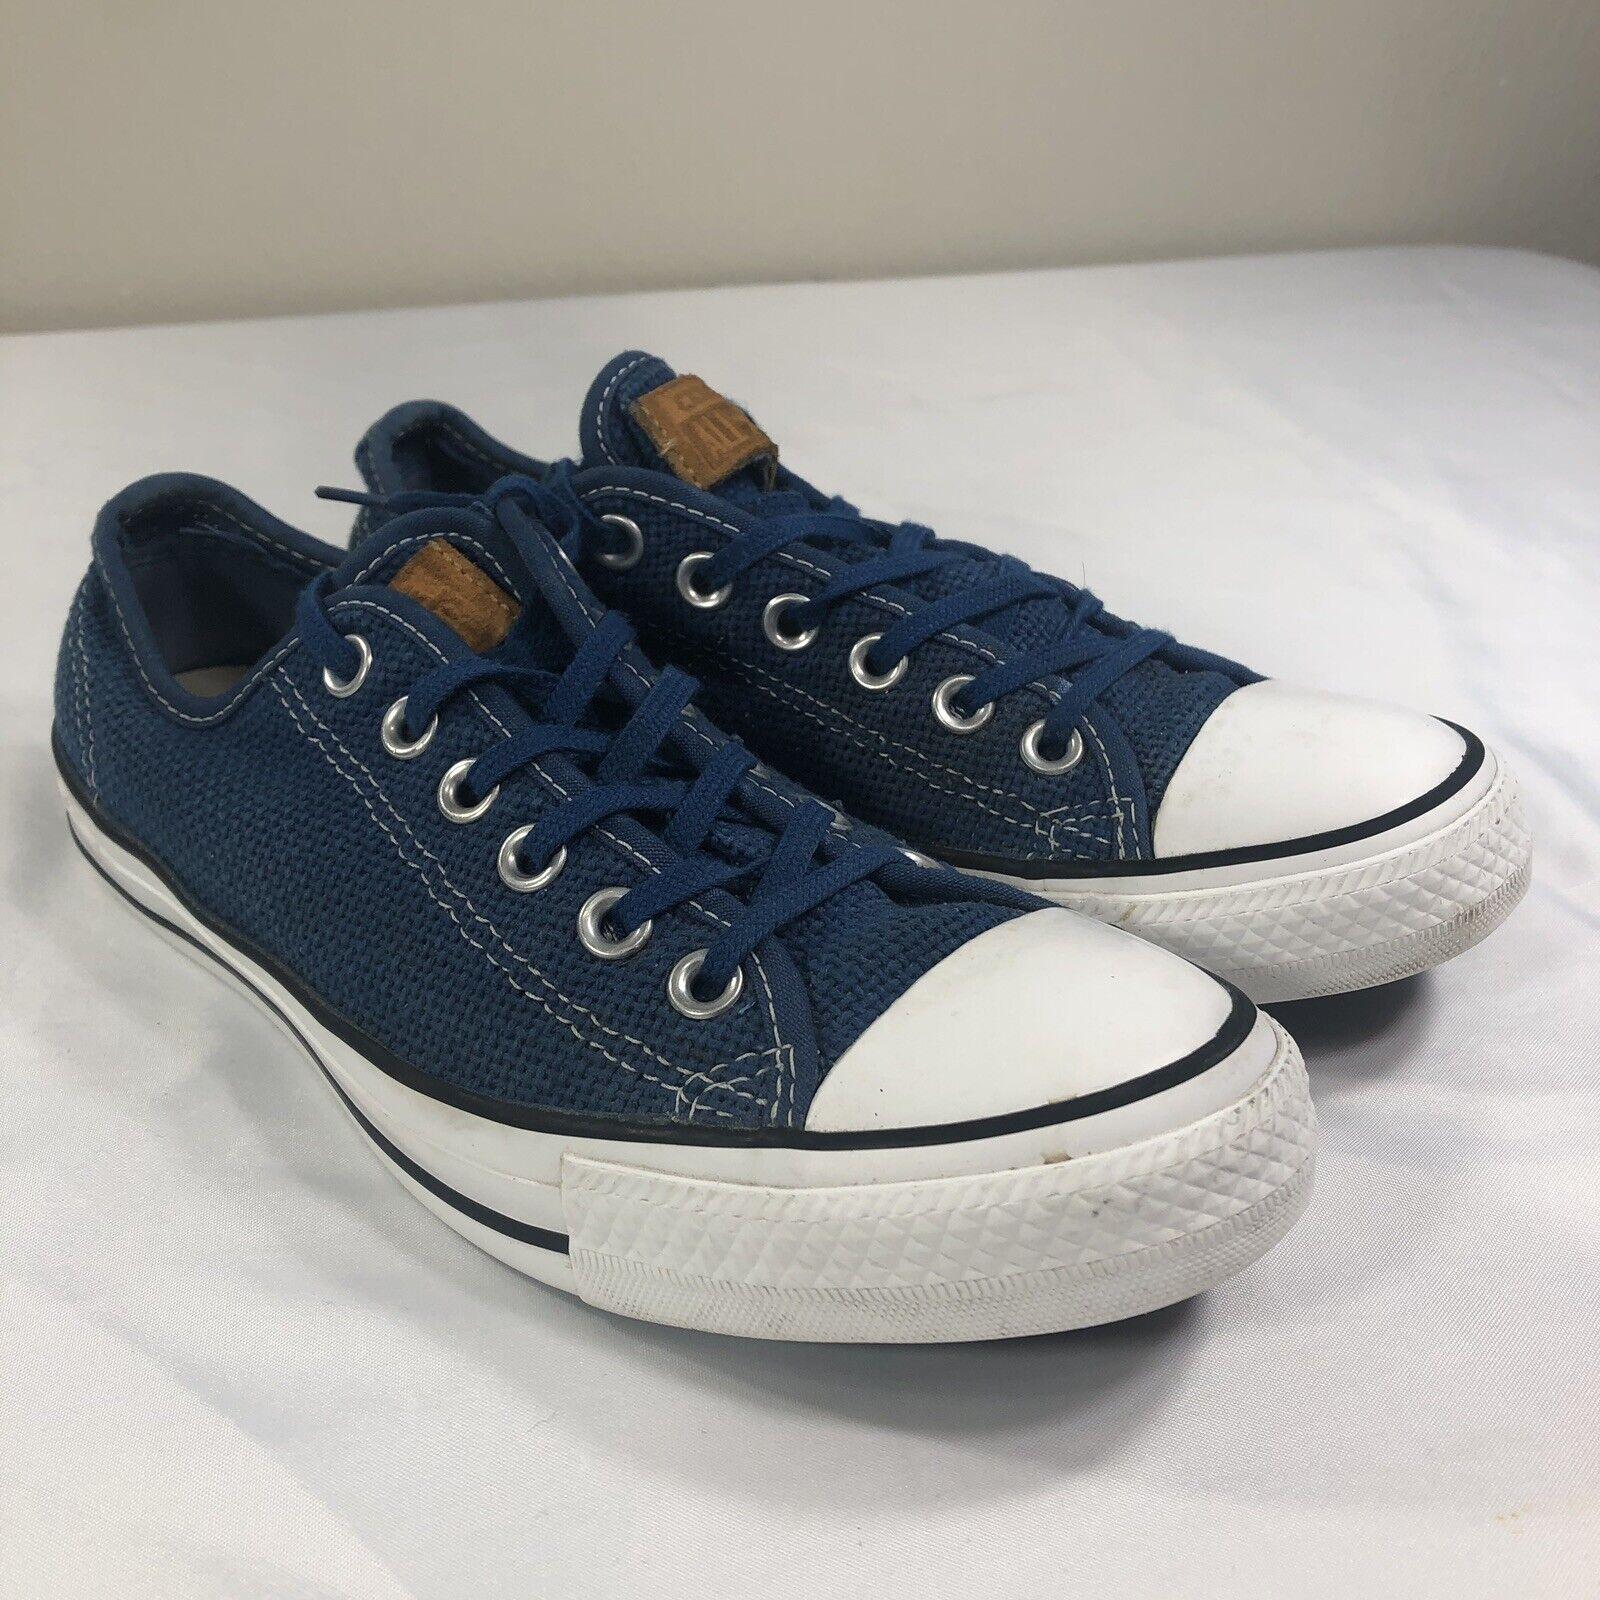 Converse All Star Chuck Taylor Men's 6.5 Women 8.5 Sneakers Woven bluee Low Top